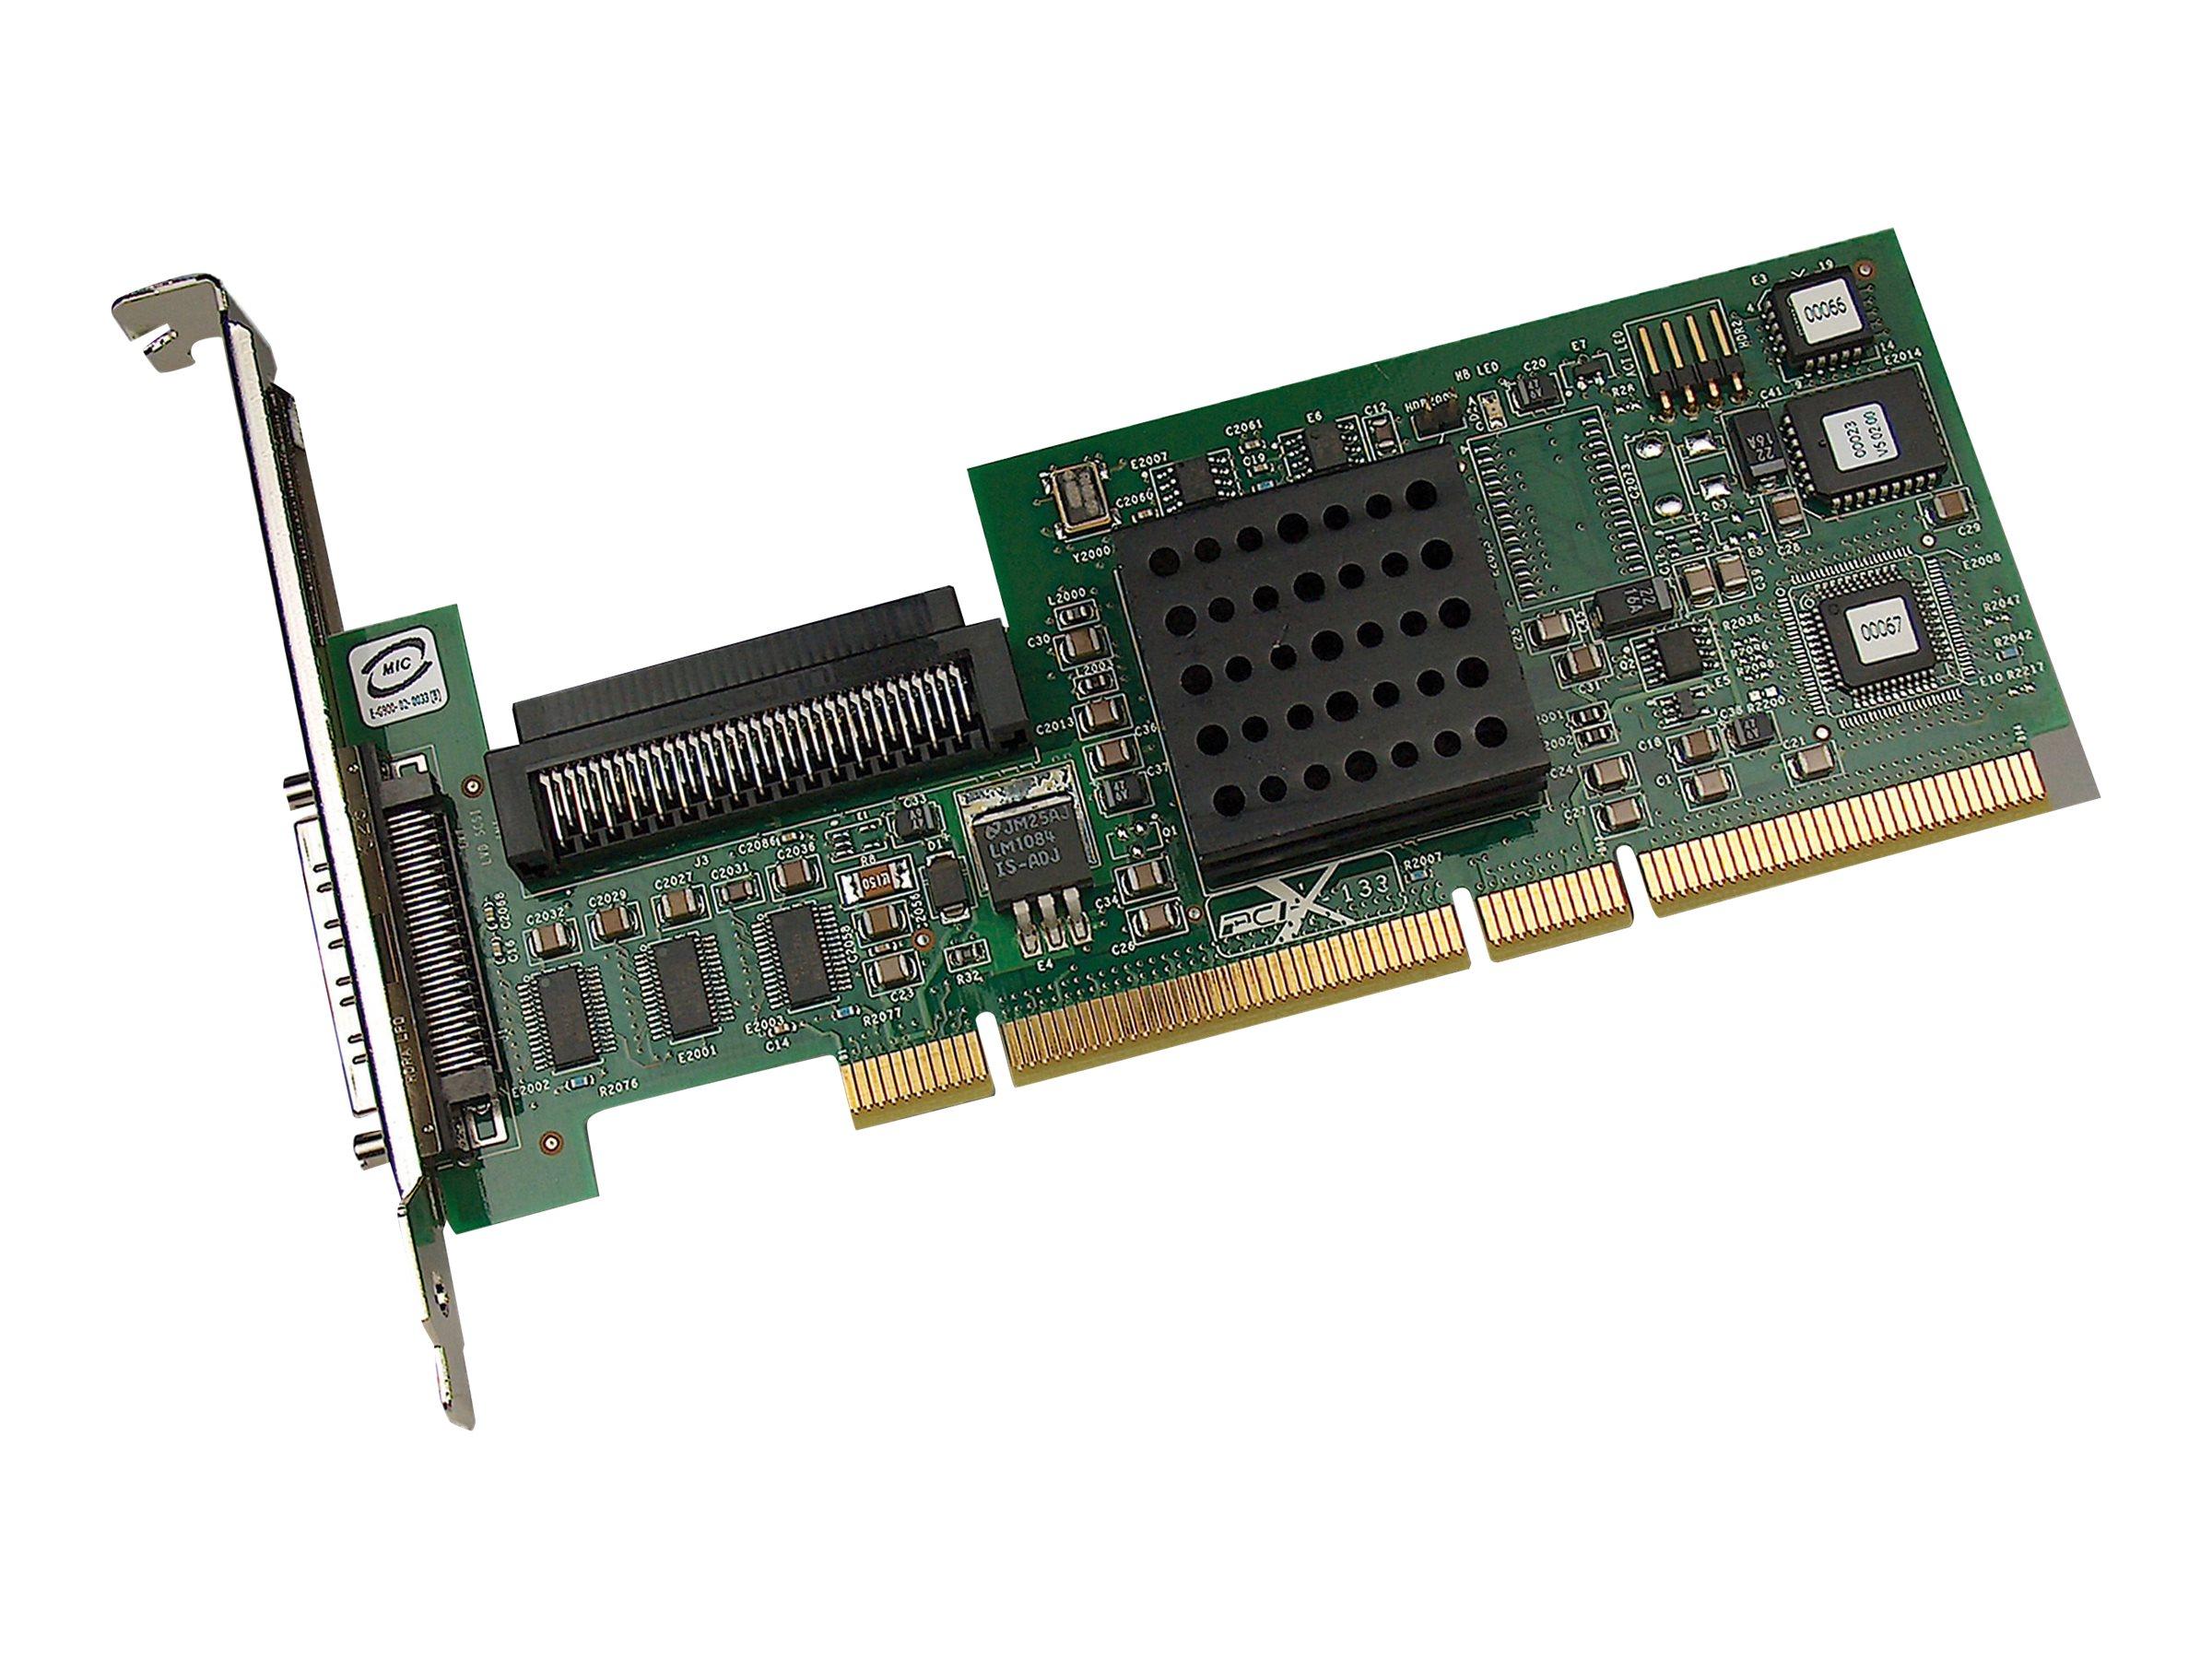 LSI LSI20320 - Speicher-Controller - 1 Sender/Kanal - Ultra320 SCSI - 320 MBps - PCI-X/133 MHz